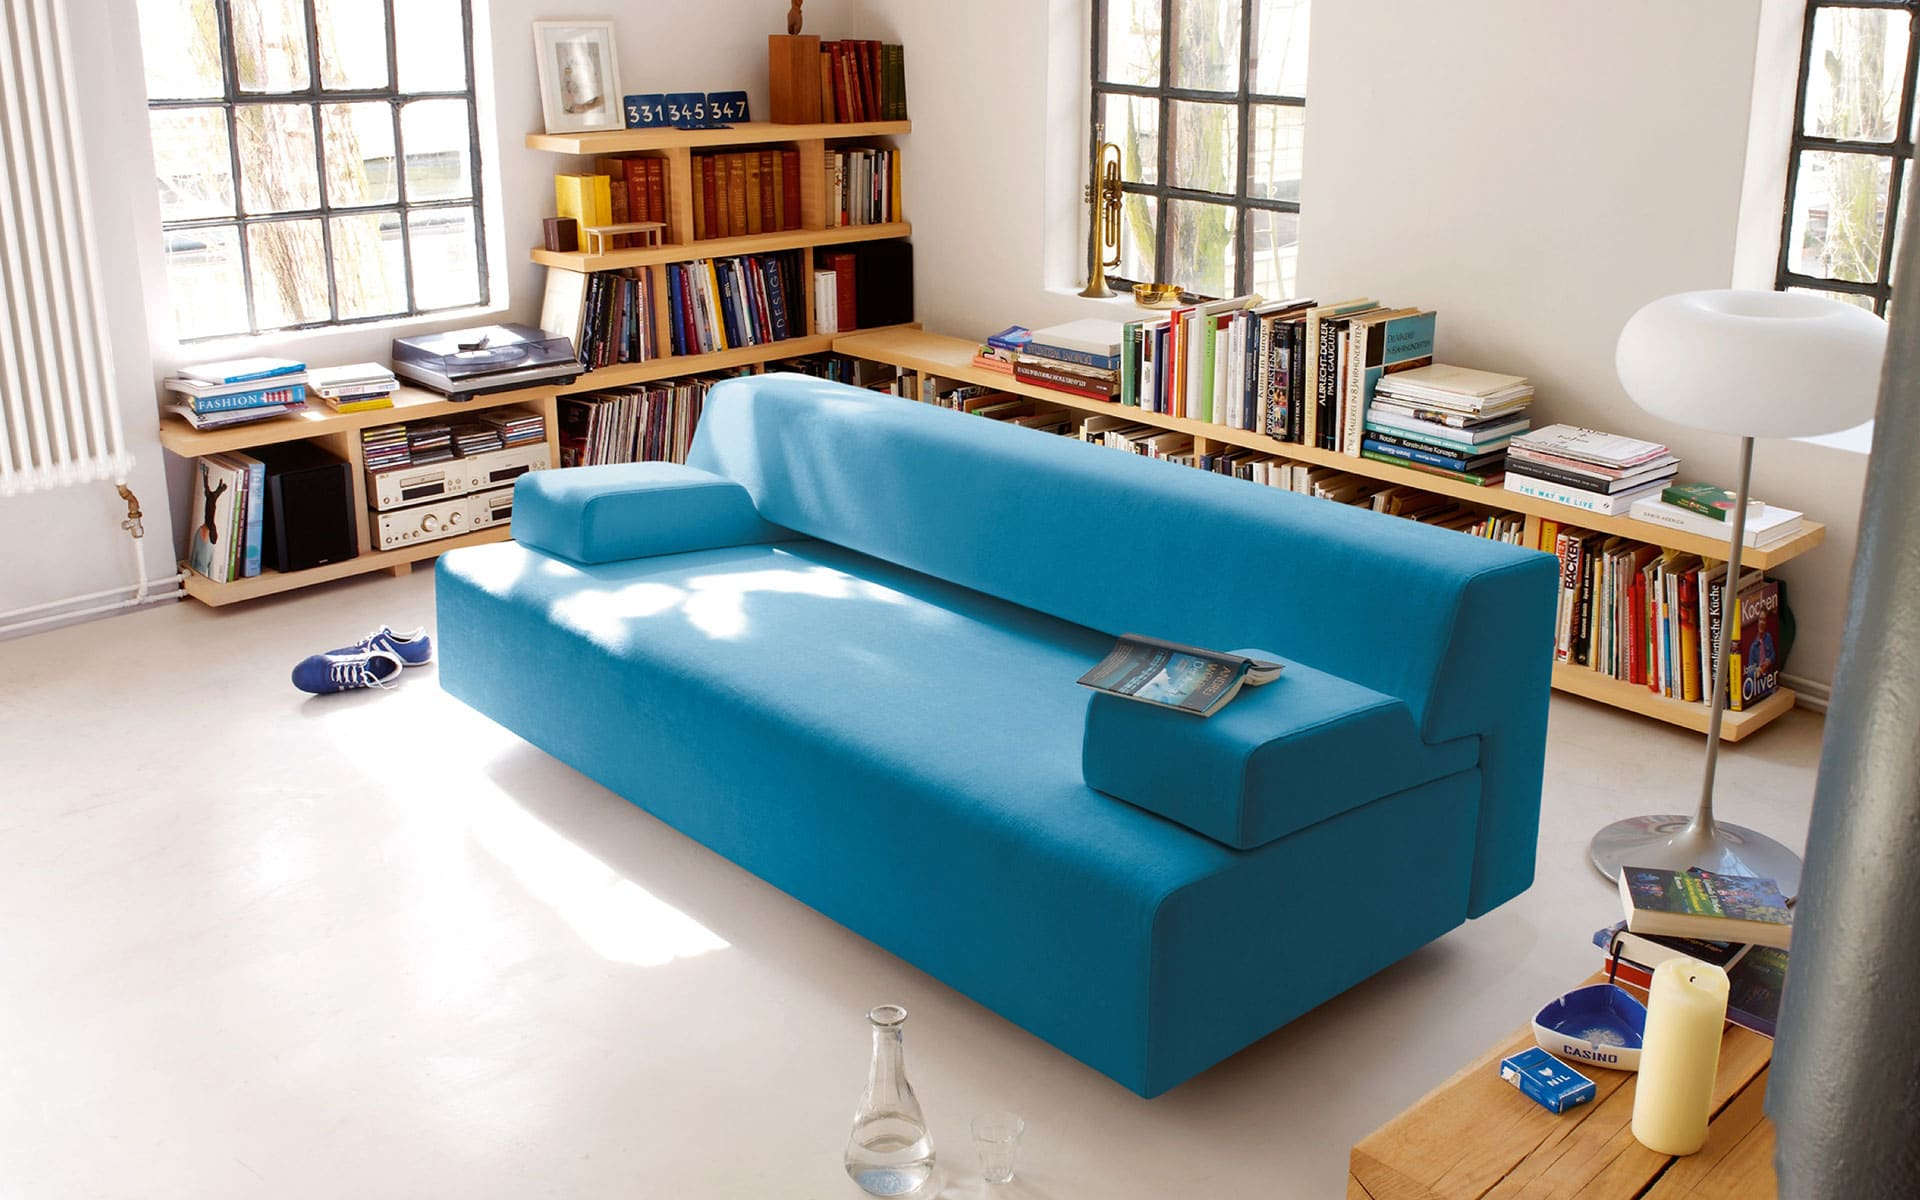 cosma schlafsofa cor. Black Bedroom Furniture Sets. Home Design Ideas